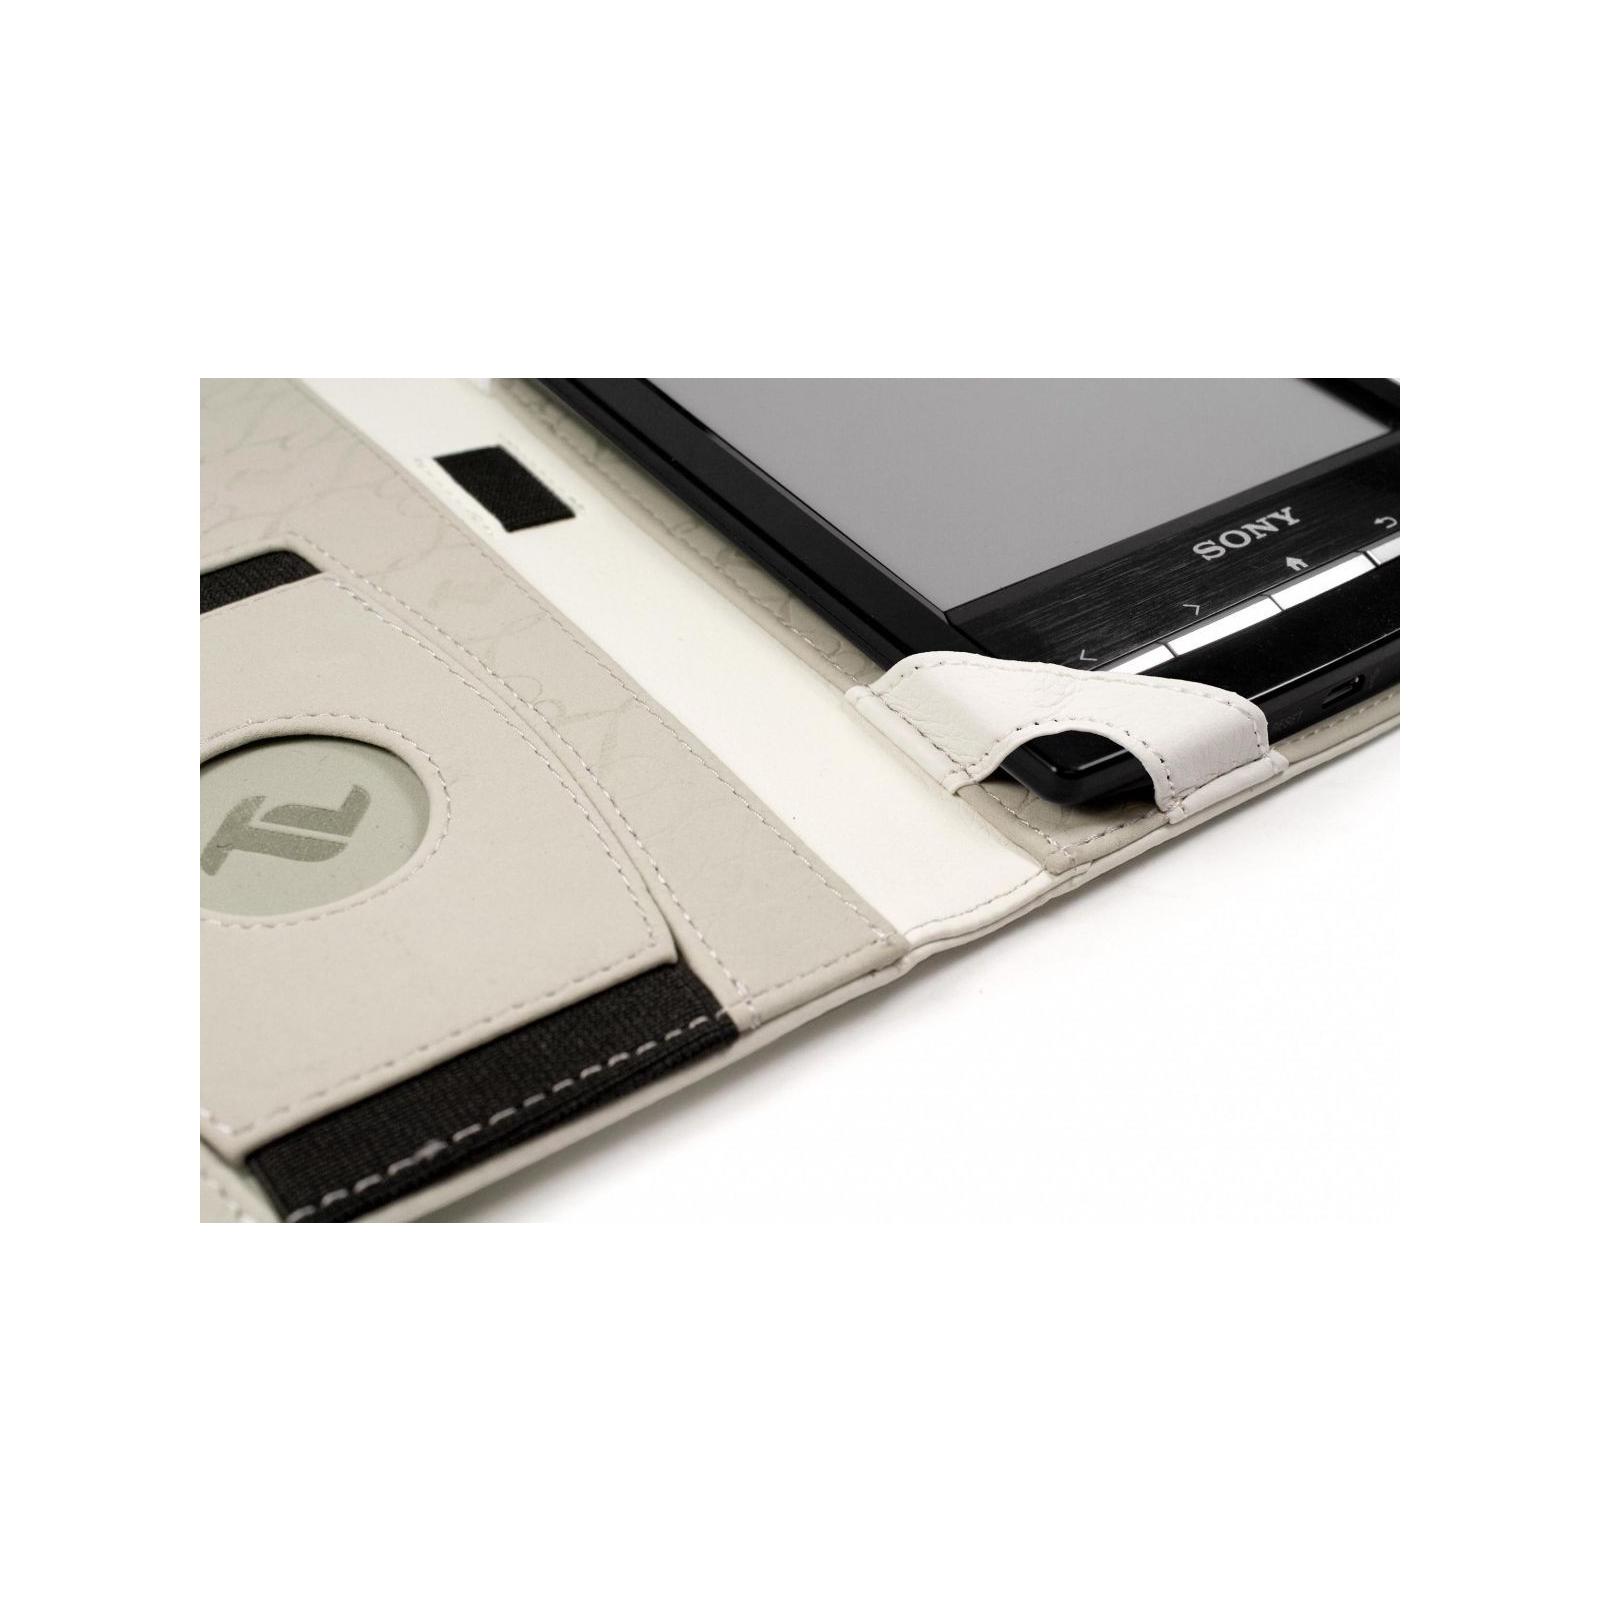 Чехол для электронной книги Tuff-Luv 6 Embrace faux leather/Arctic White (C4_56) изображение 4